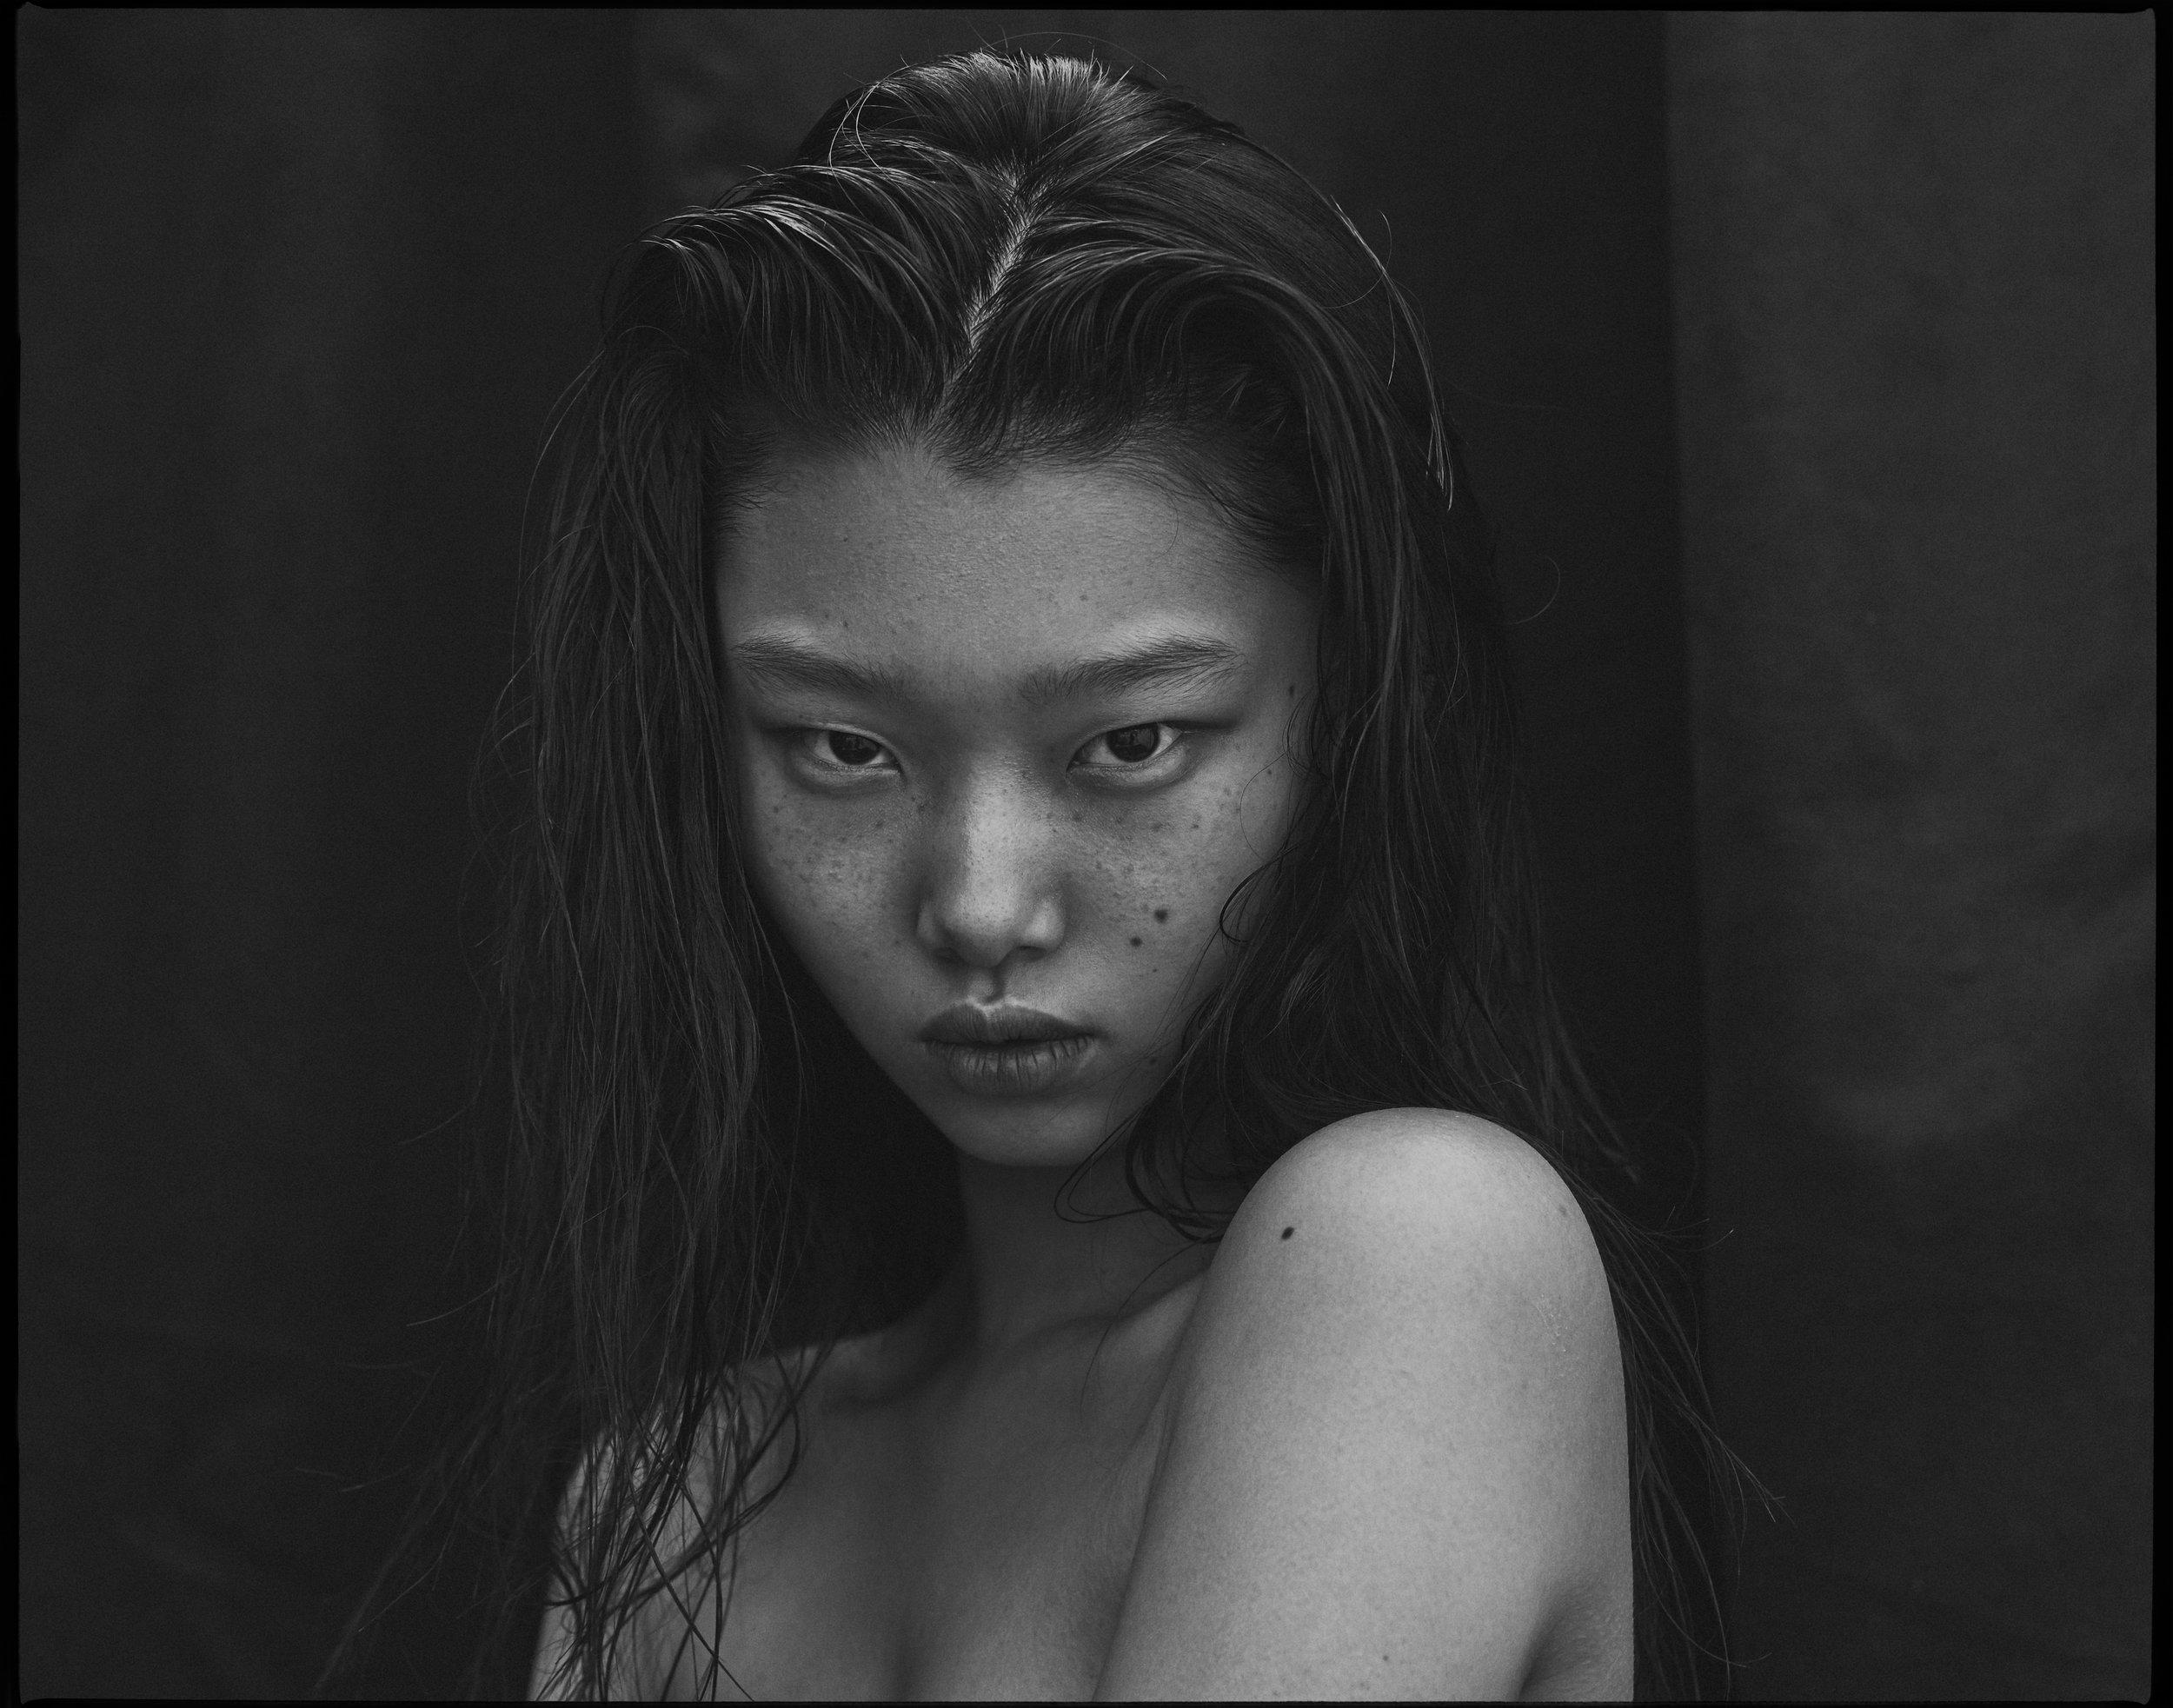 Yoon Young Bae_Scott Mac Donough_0309b.jpg